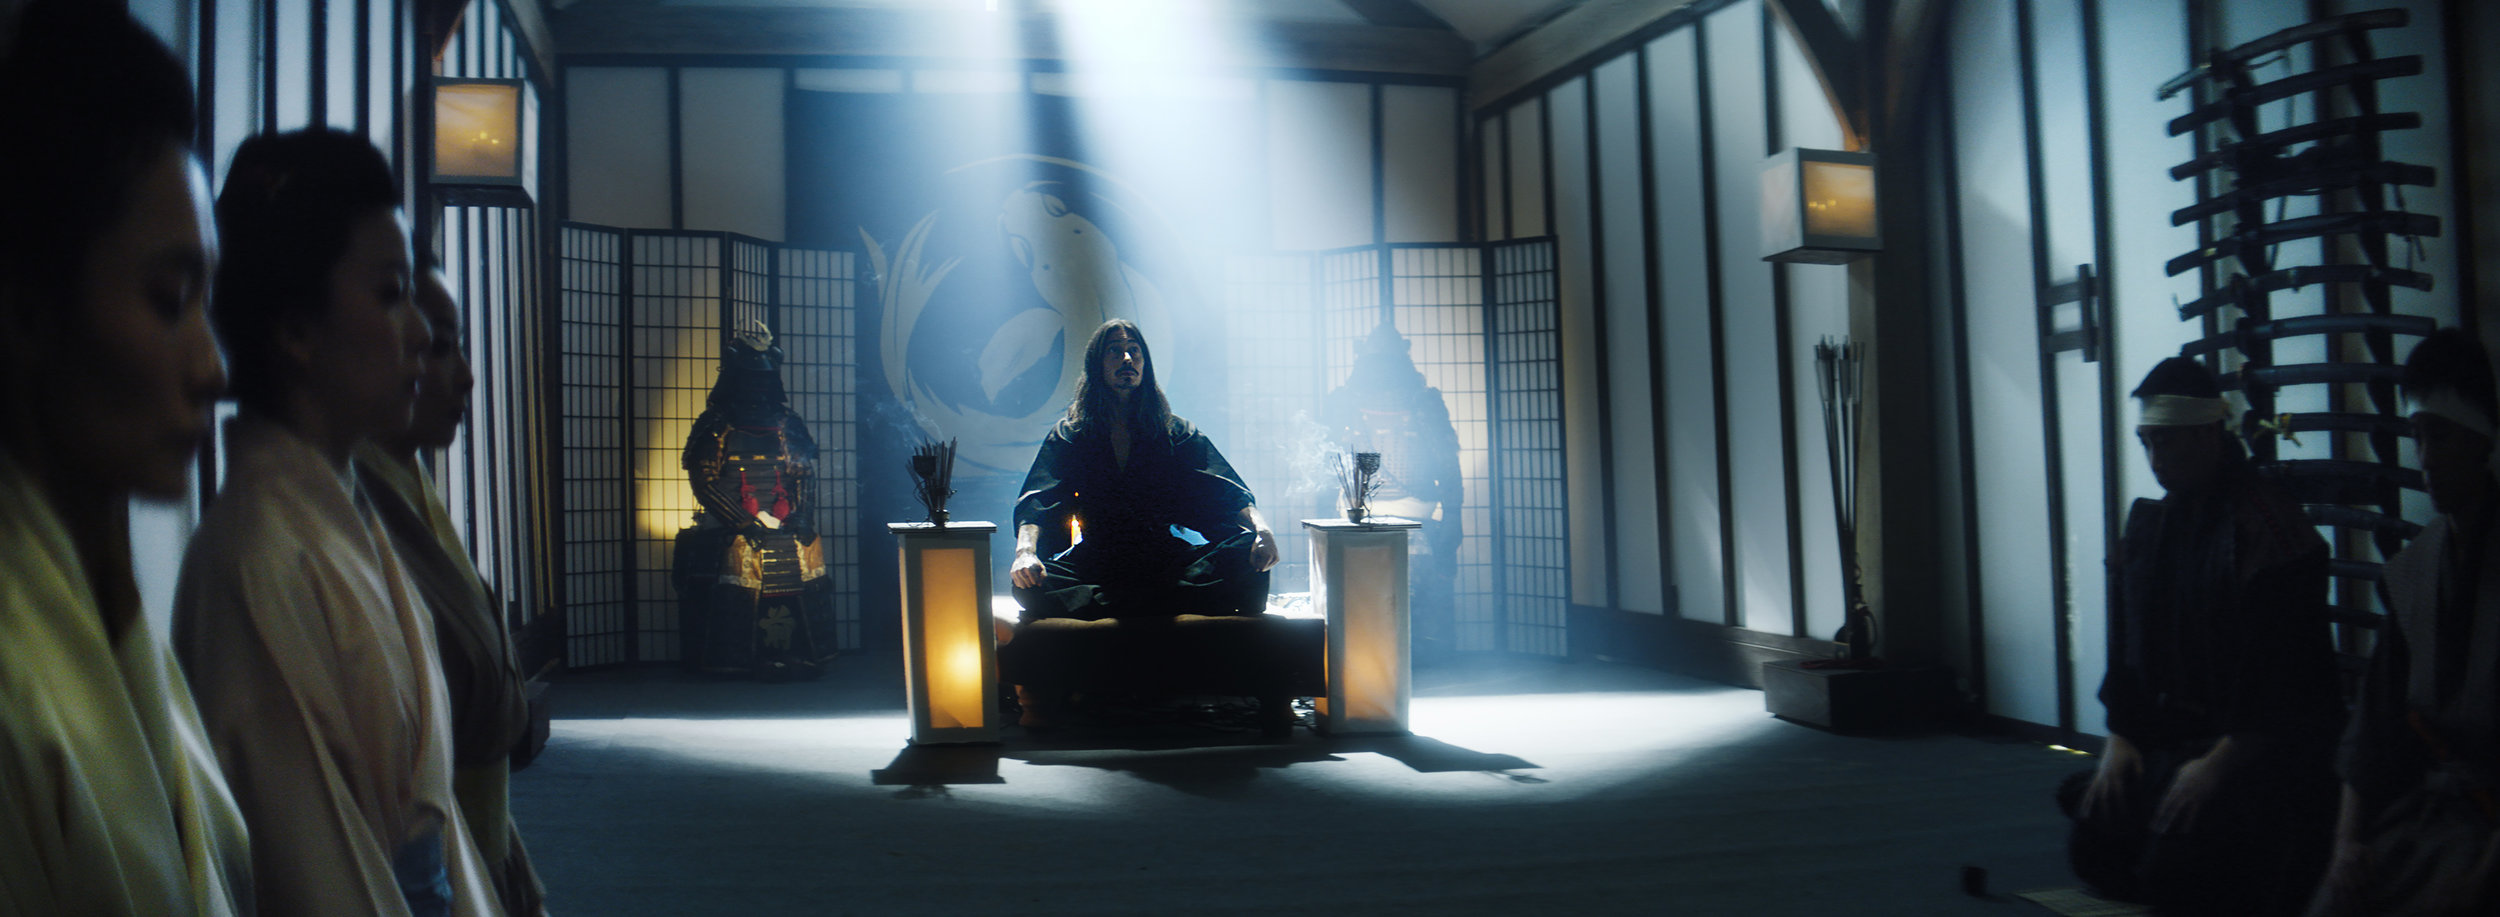 MAD LORD Samurai of 1000 Deaths - Still080.jpeg